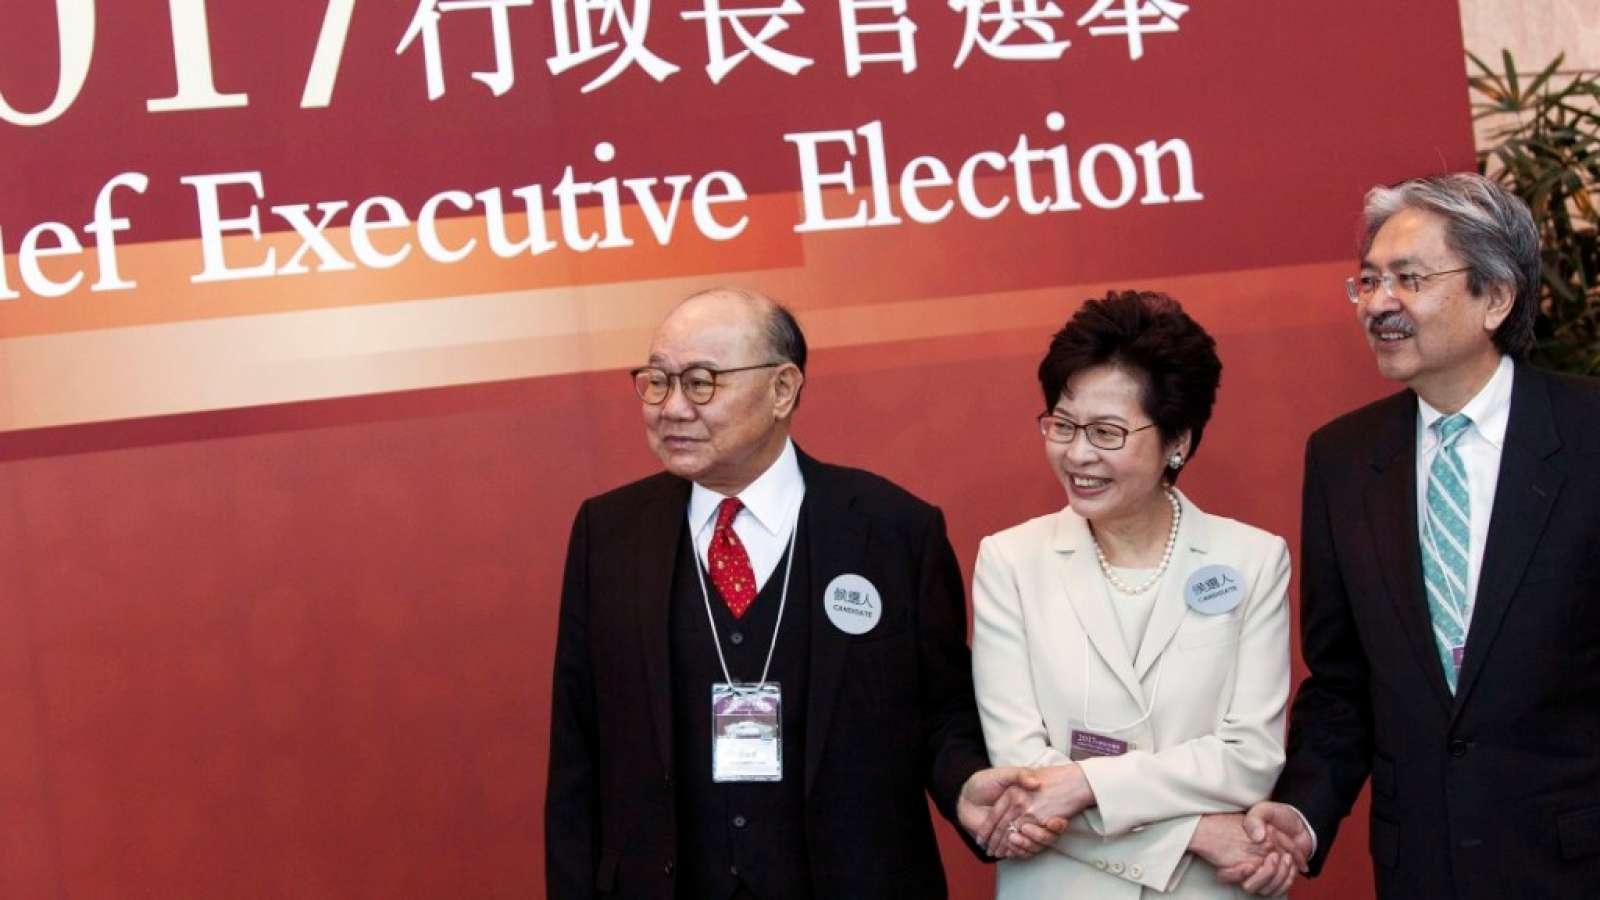 Drei Konkurrenten in Hongkong: Woo Kwok Hing (links), Favoritin Carrie Lam und John Tsang anlässlich der Wahlen in der Sonderverwaltungszone.